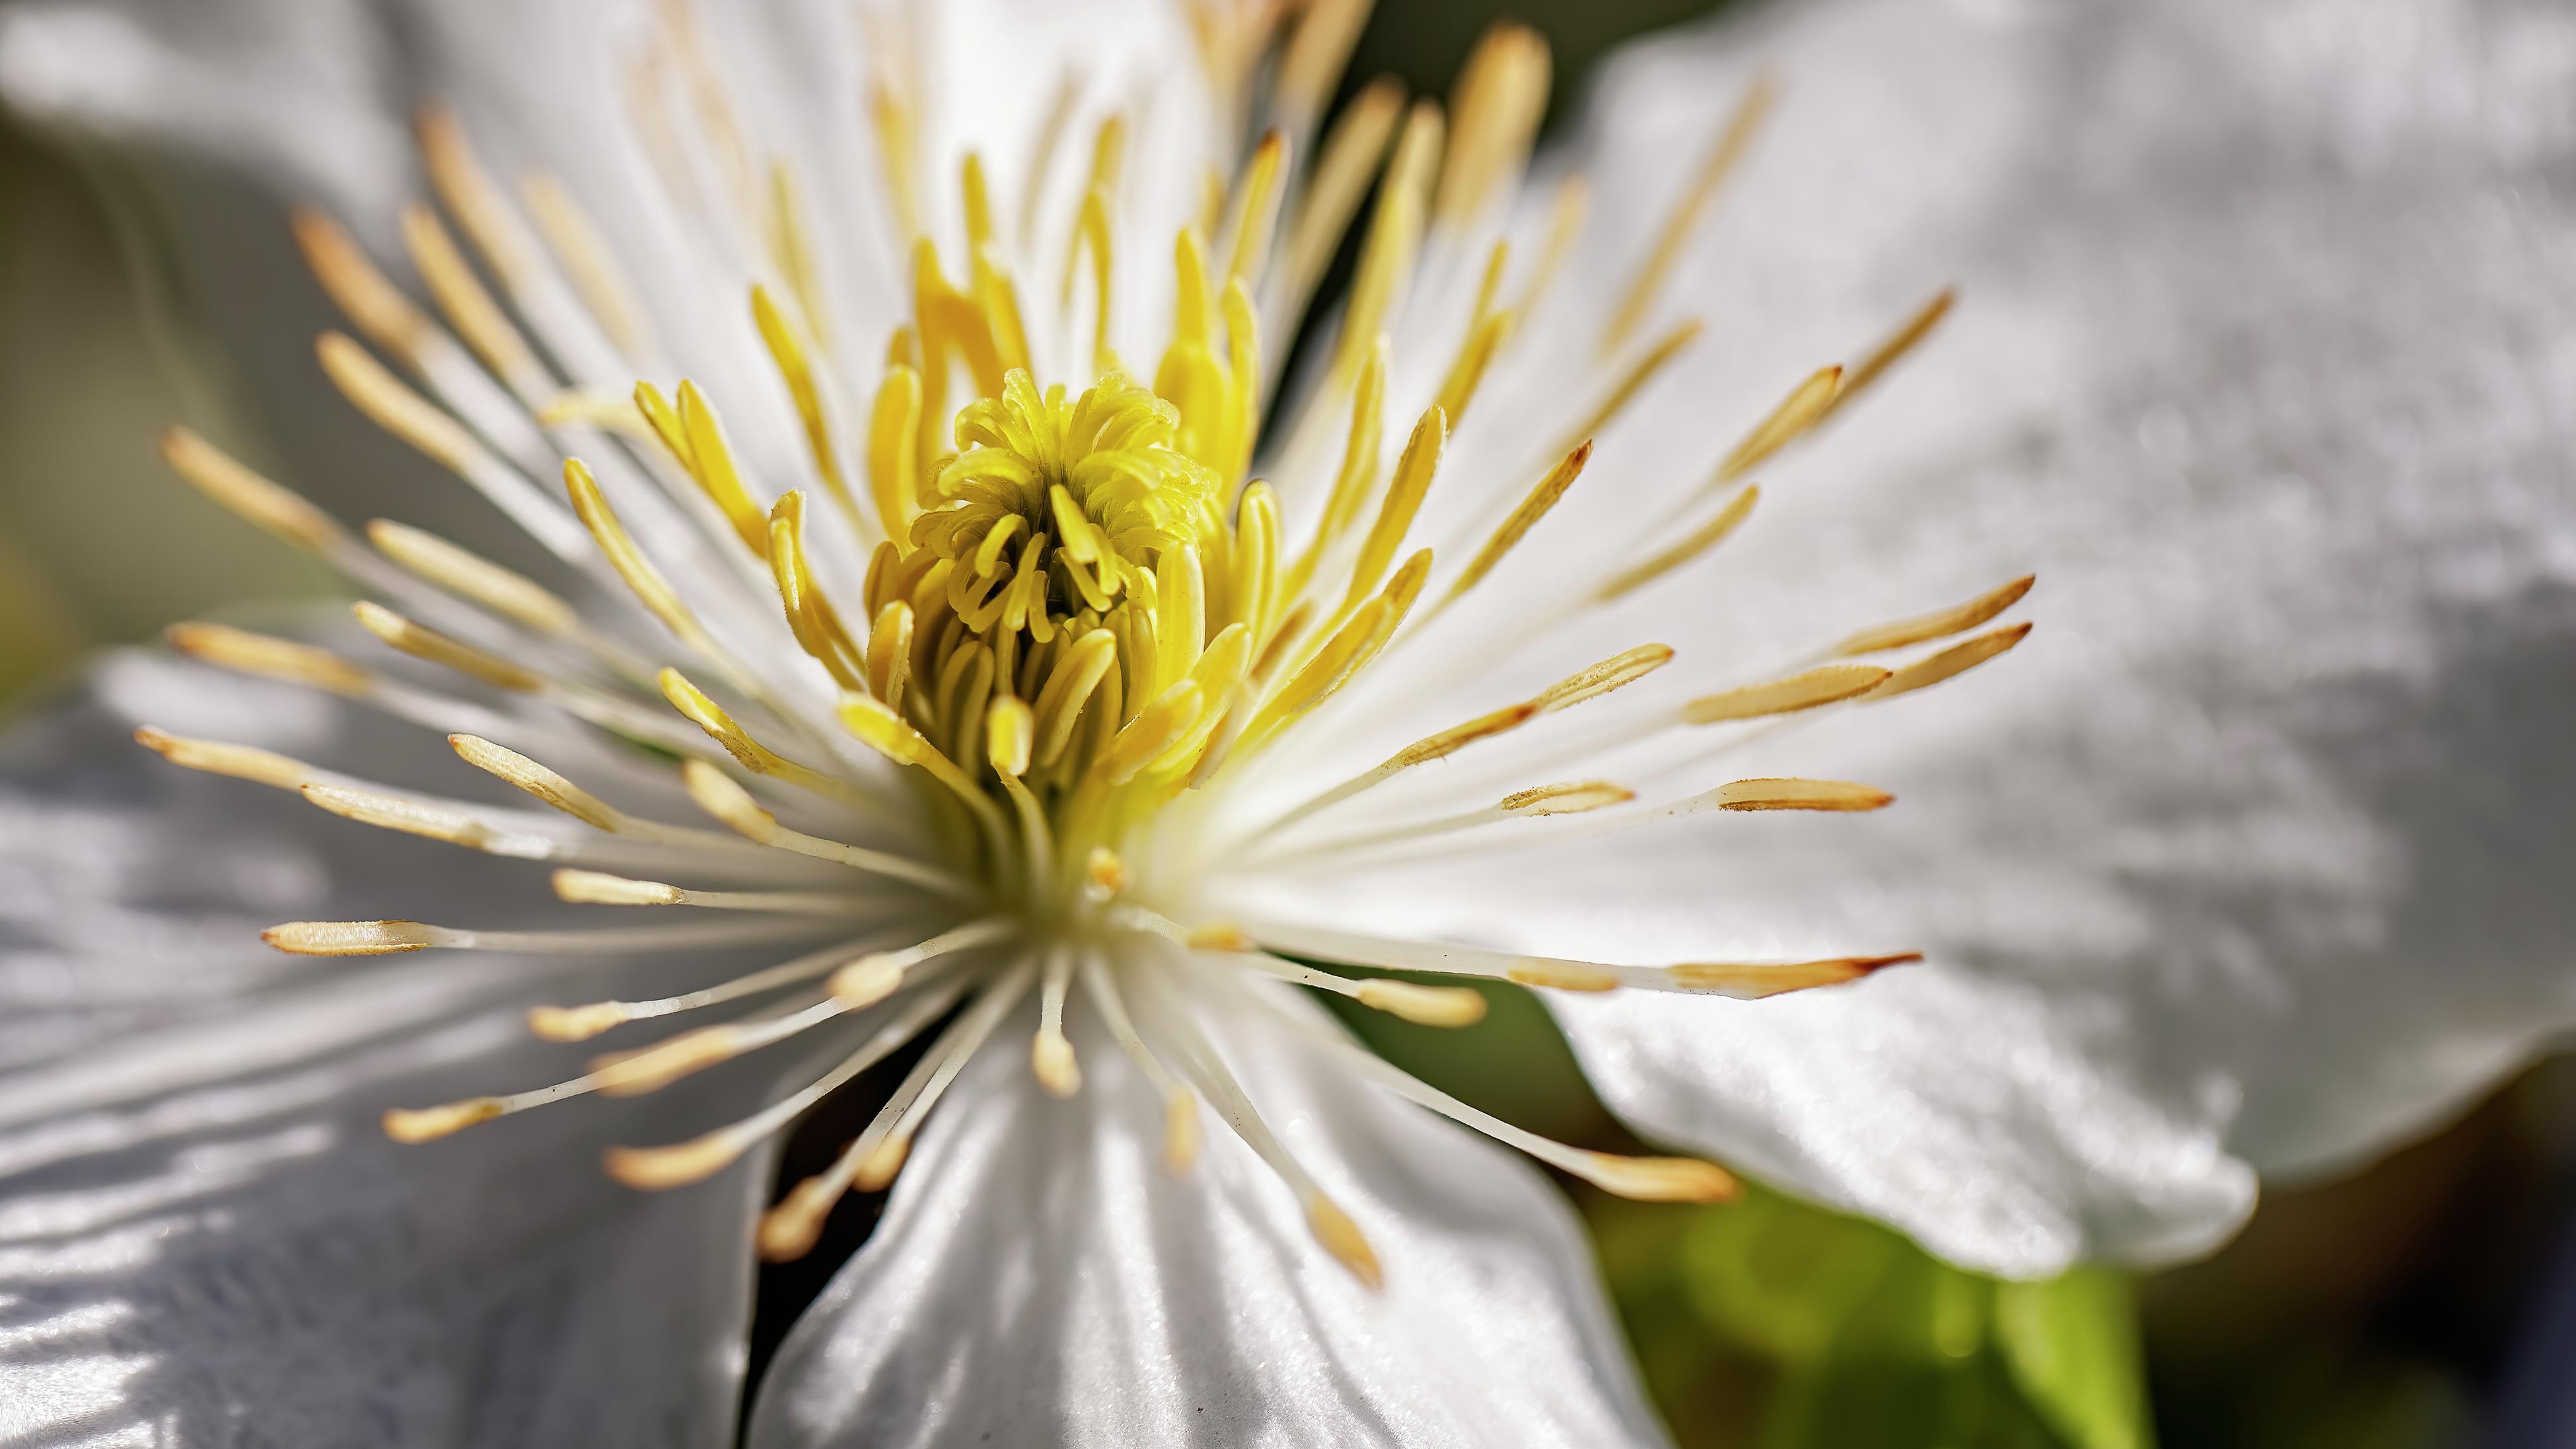 Macro shot of a white flowering clematis